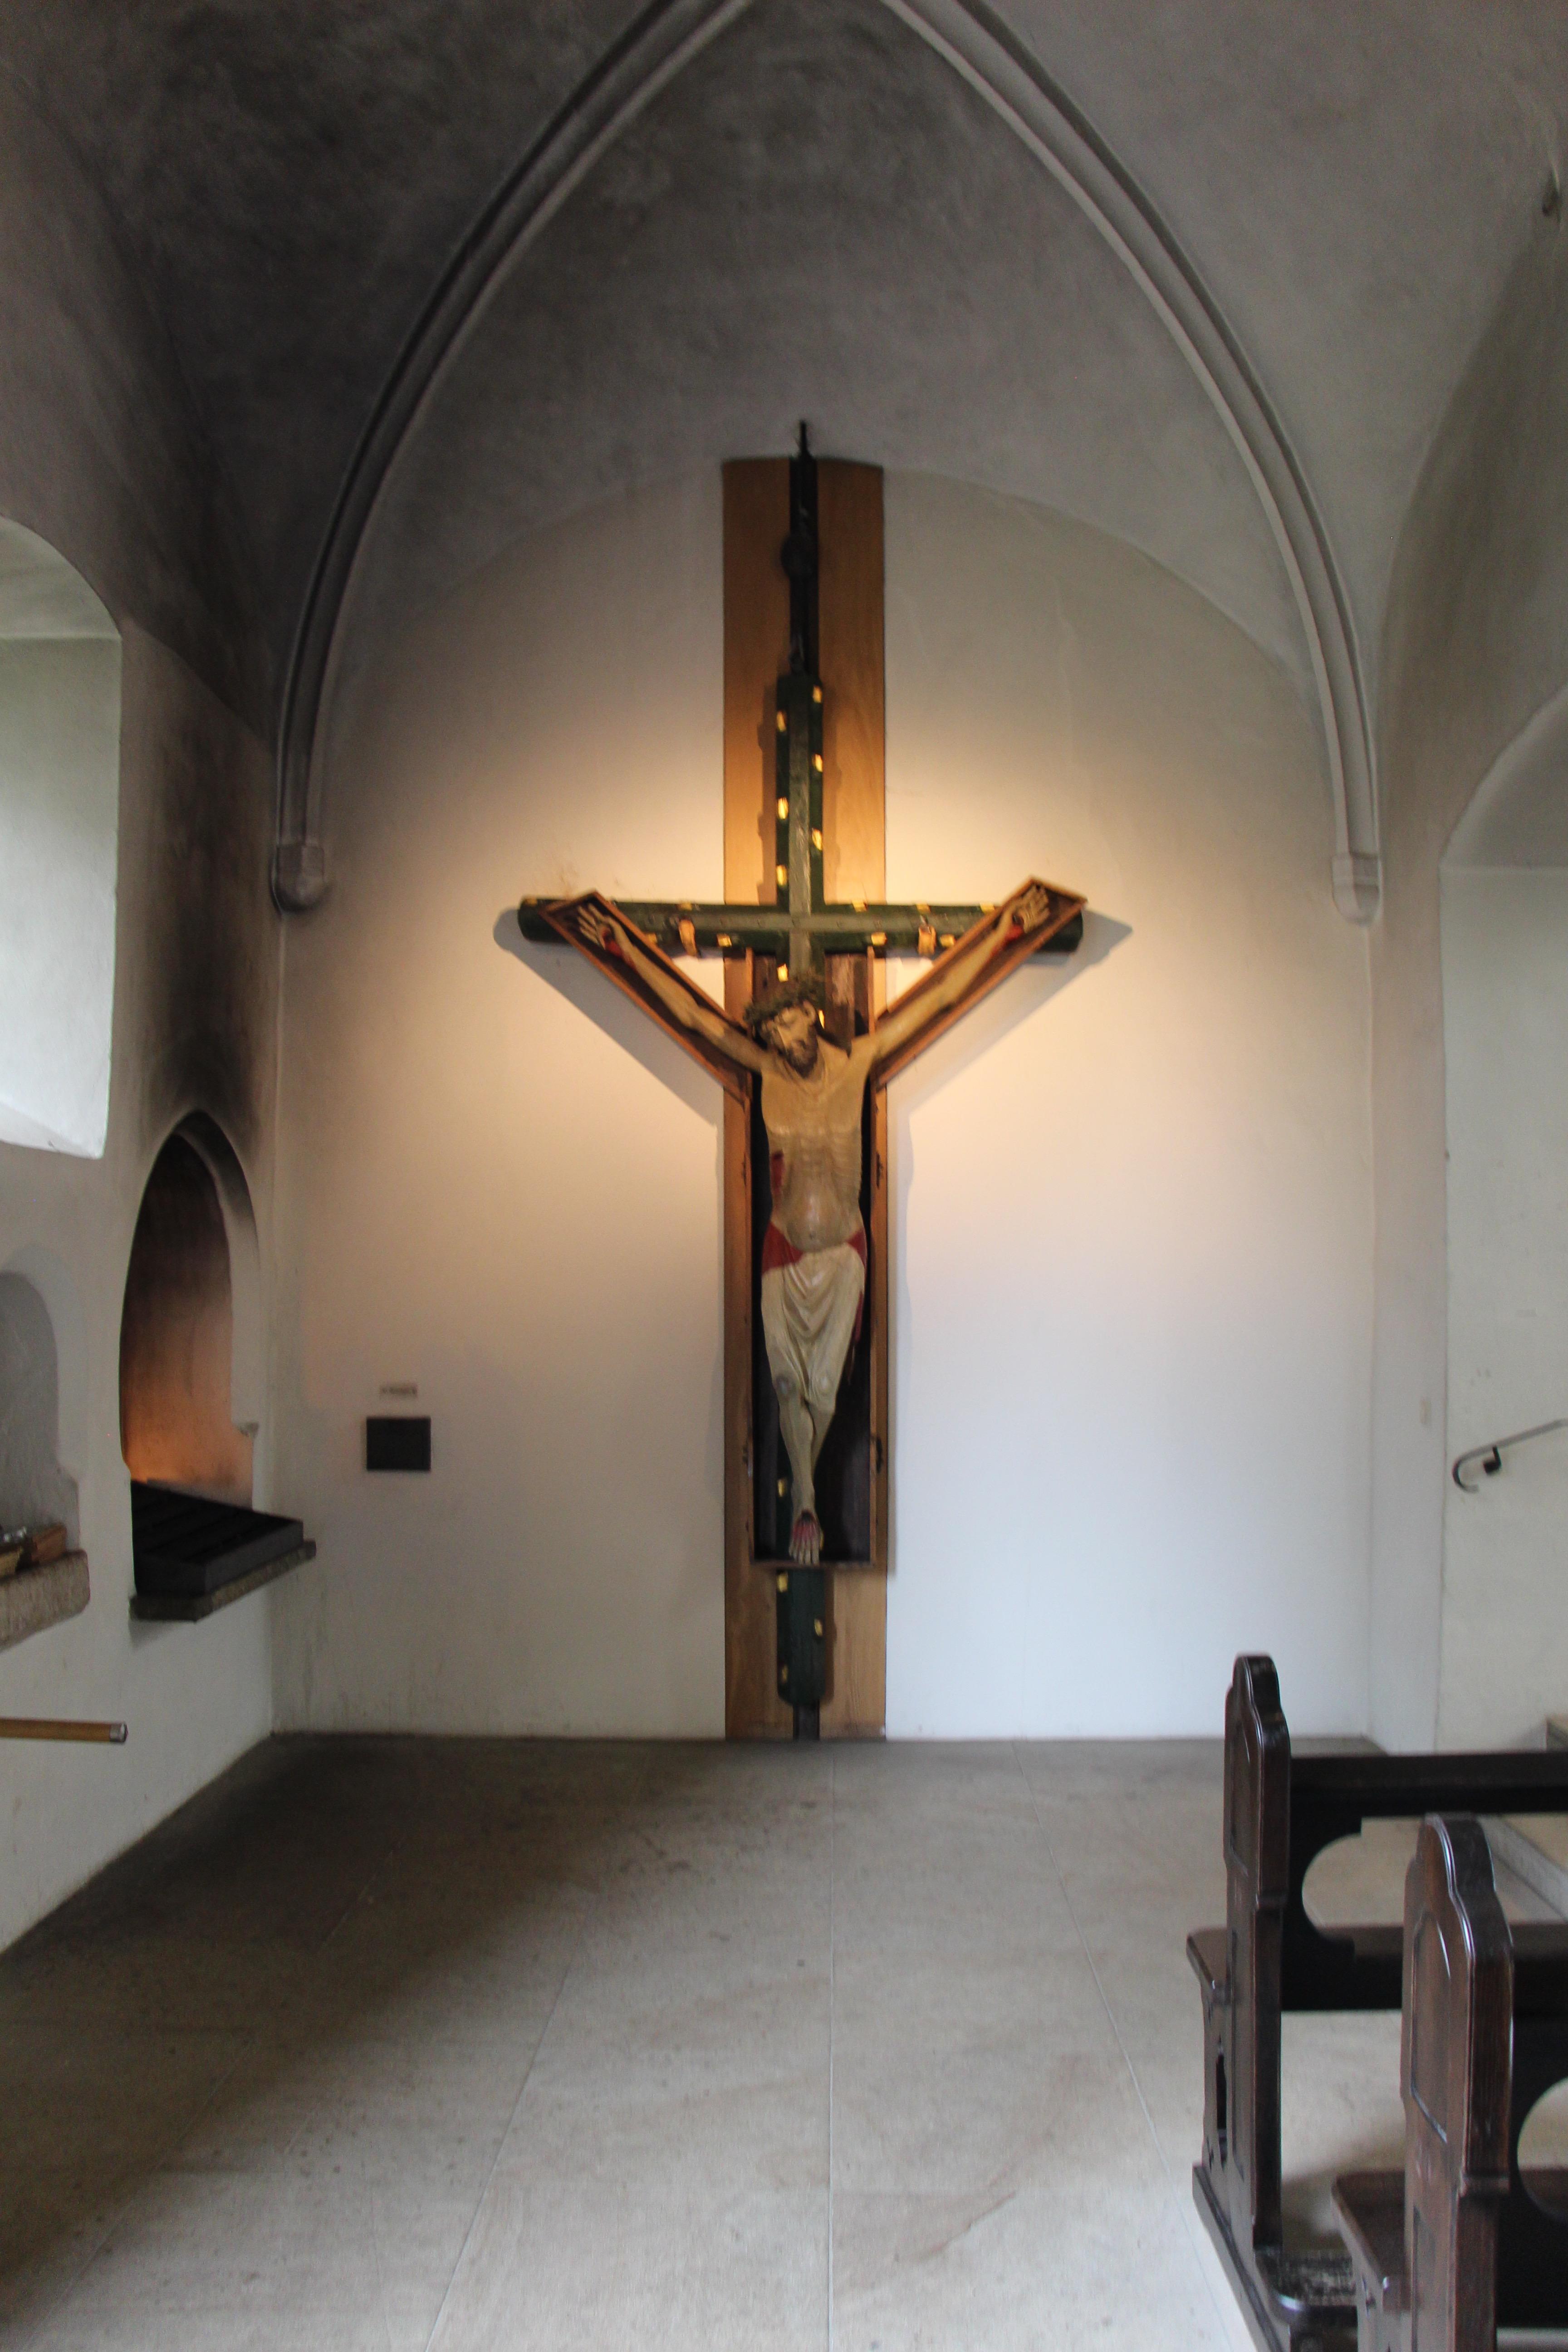 Dsa leidende Kreuz